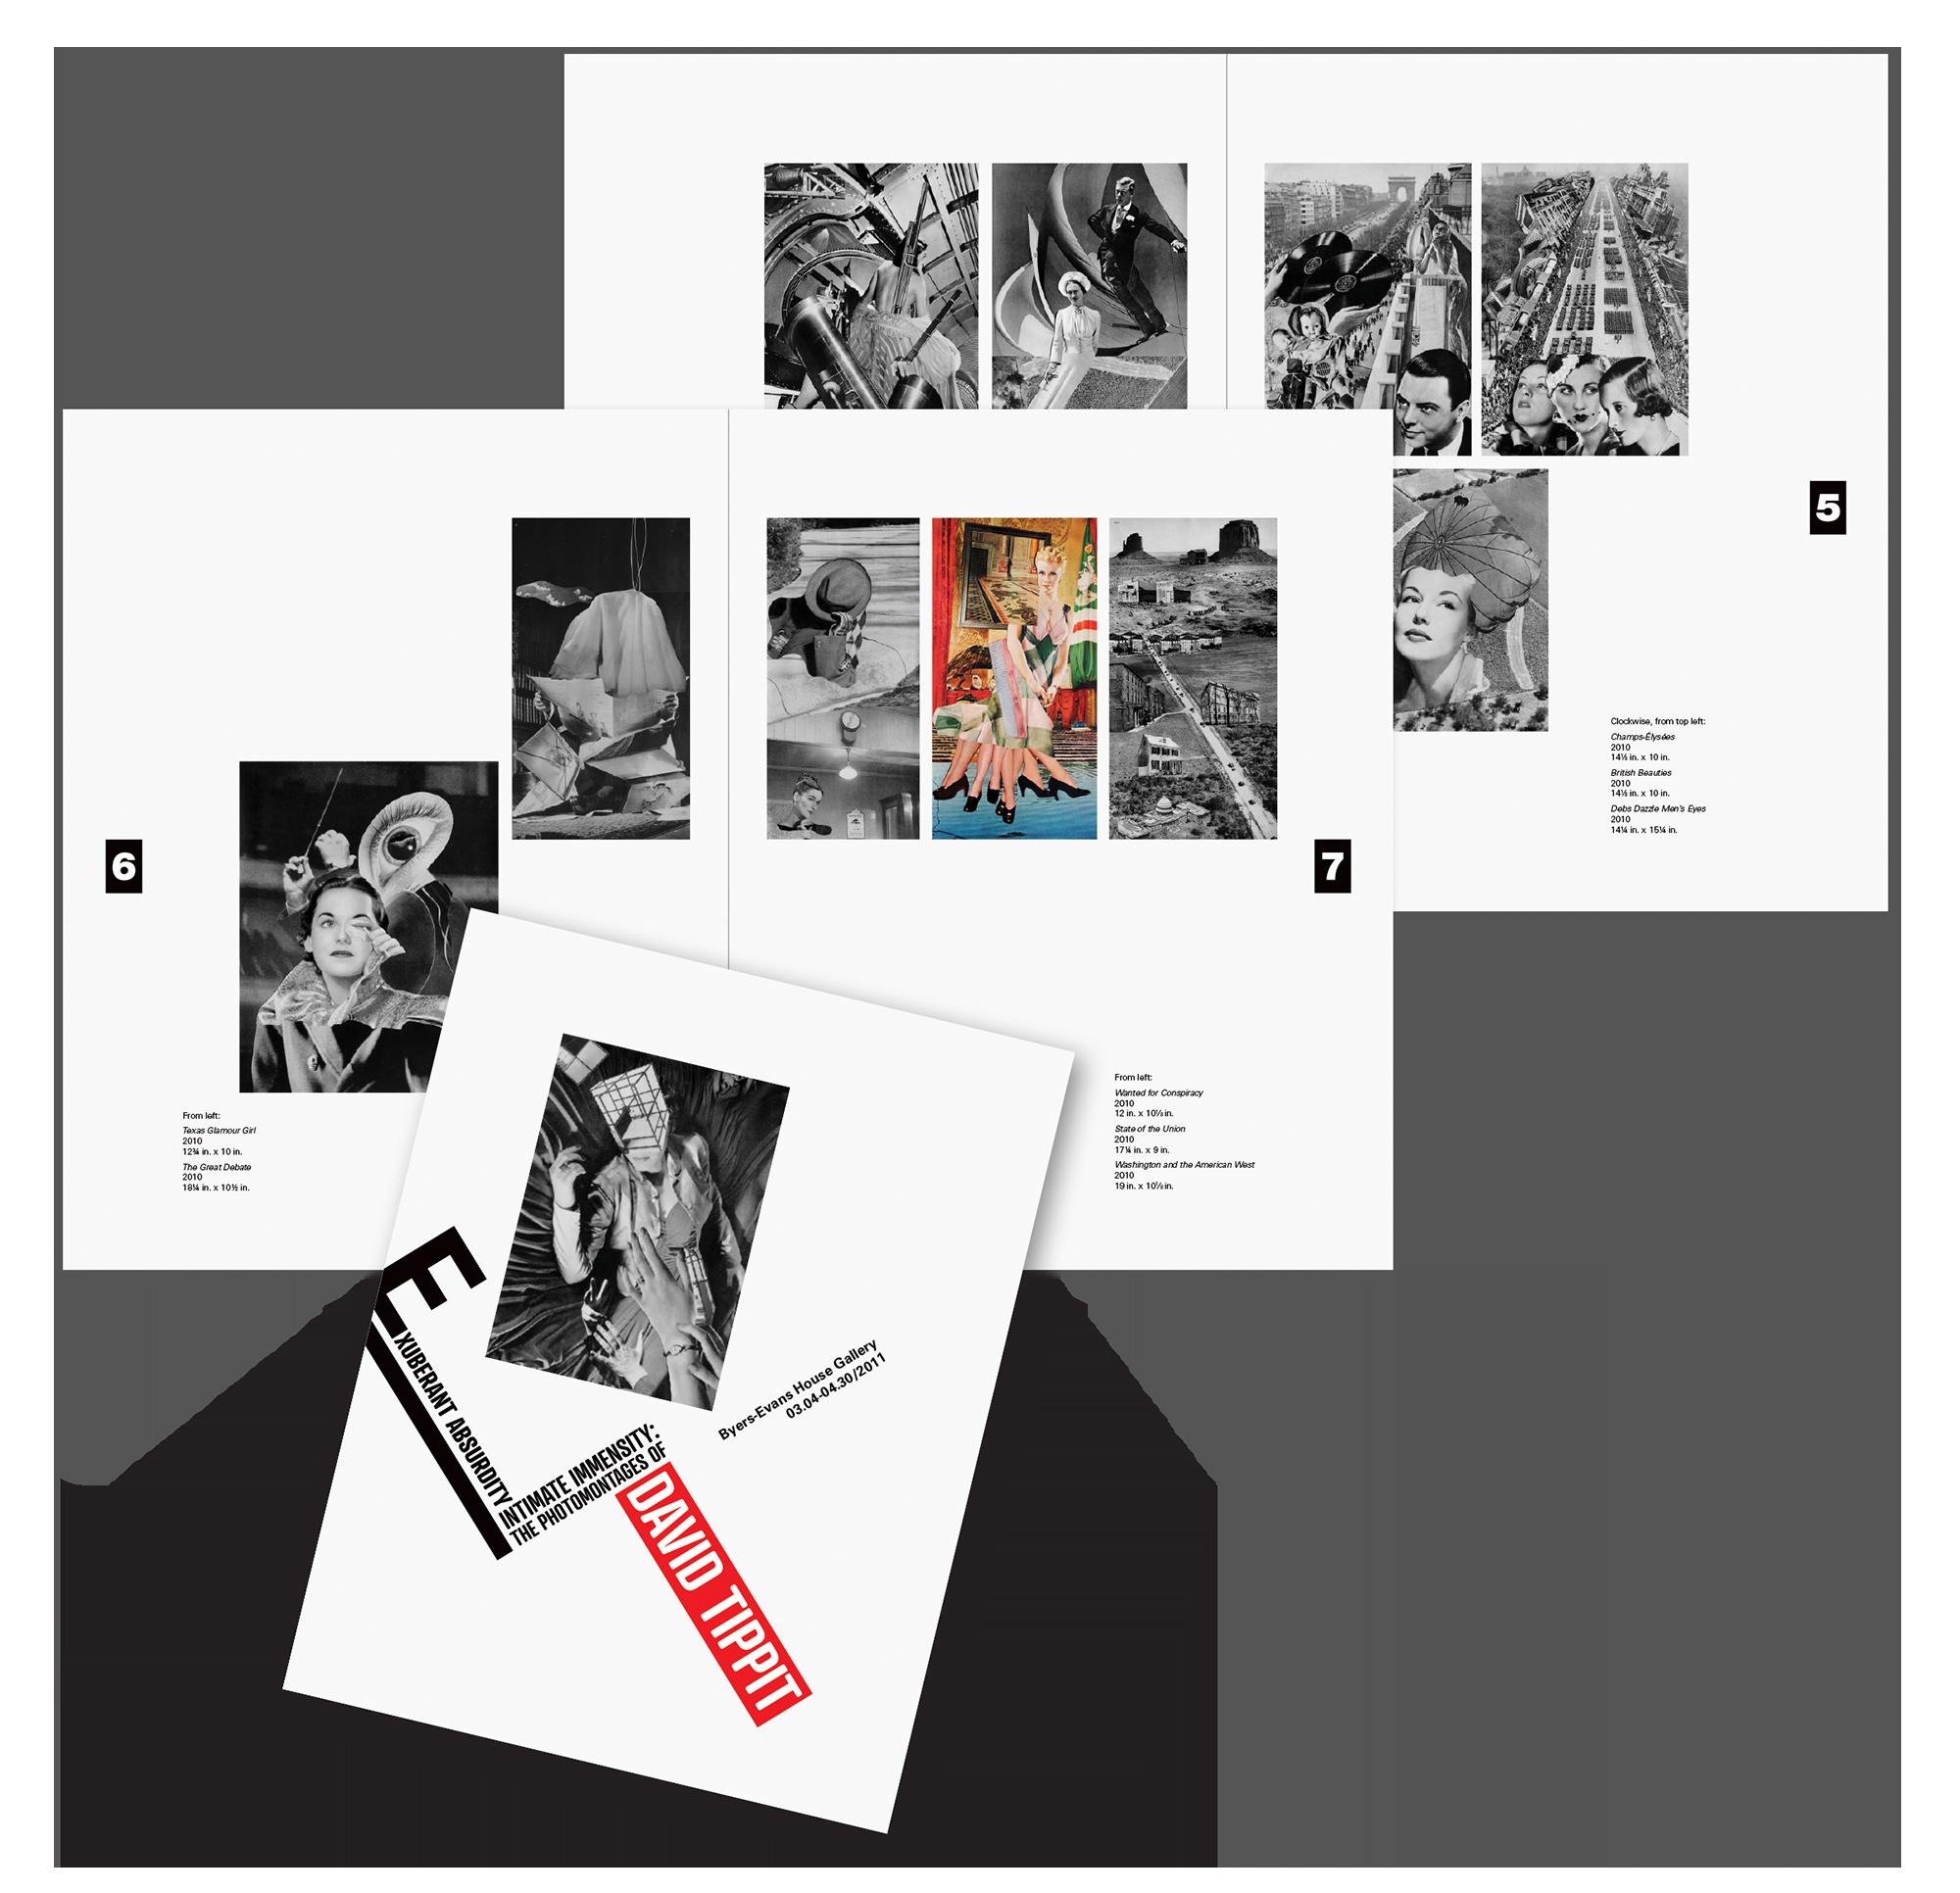 Tippit Exhibit Catalog